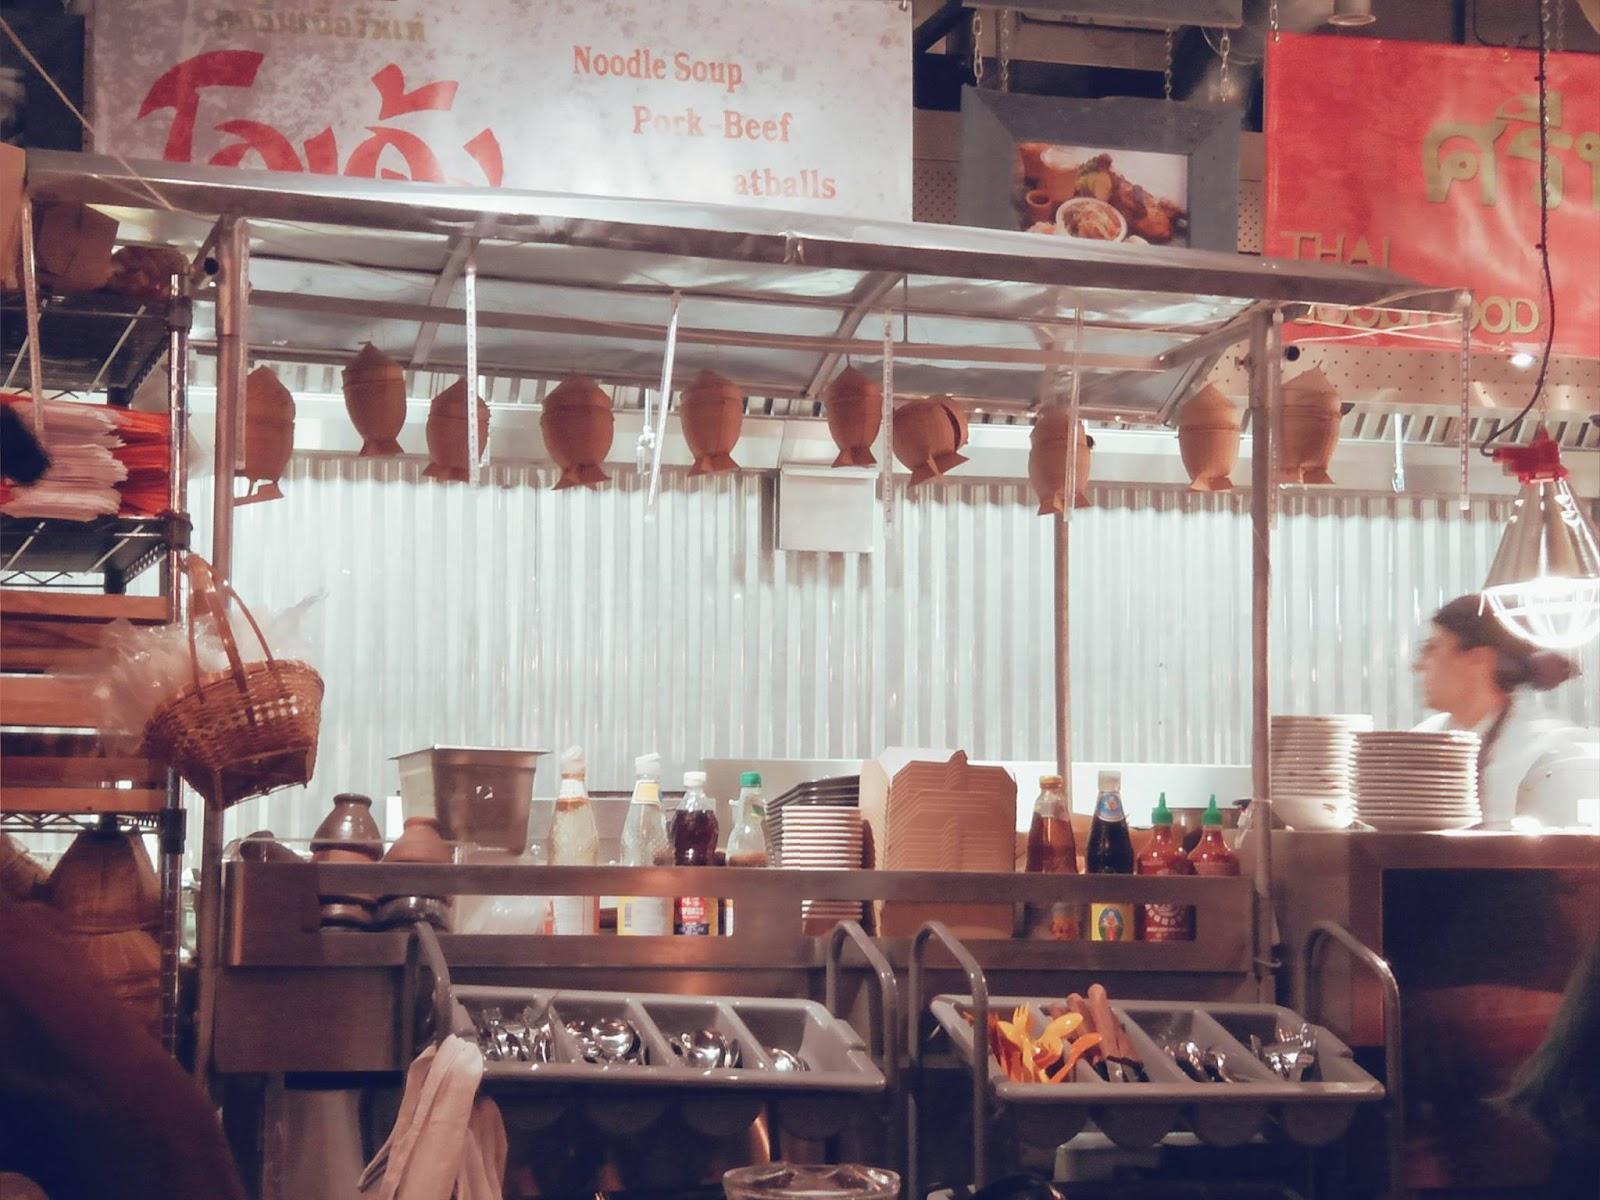 lebellelavie - A taste of Thai street food with Thaikhun